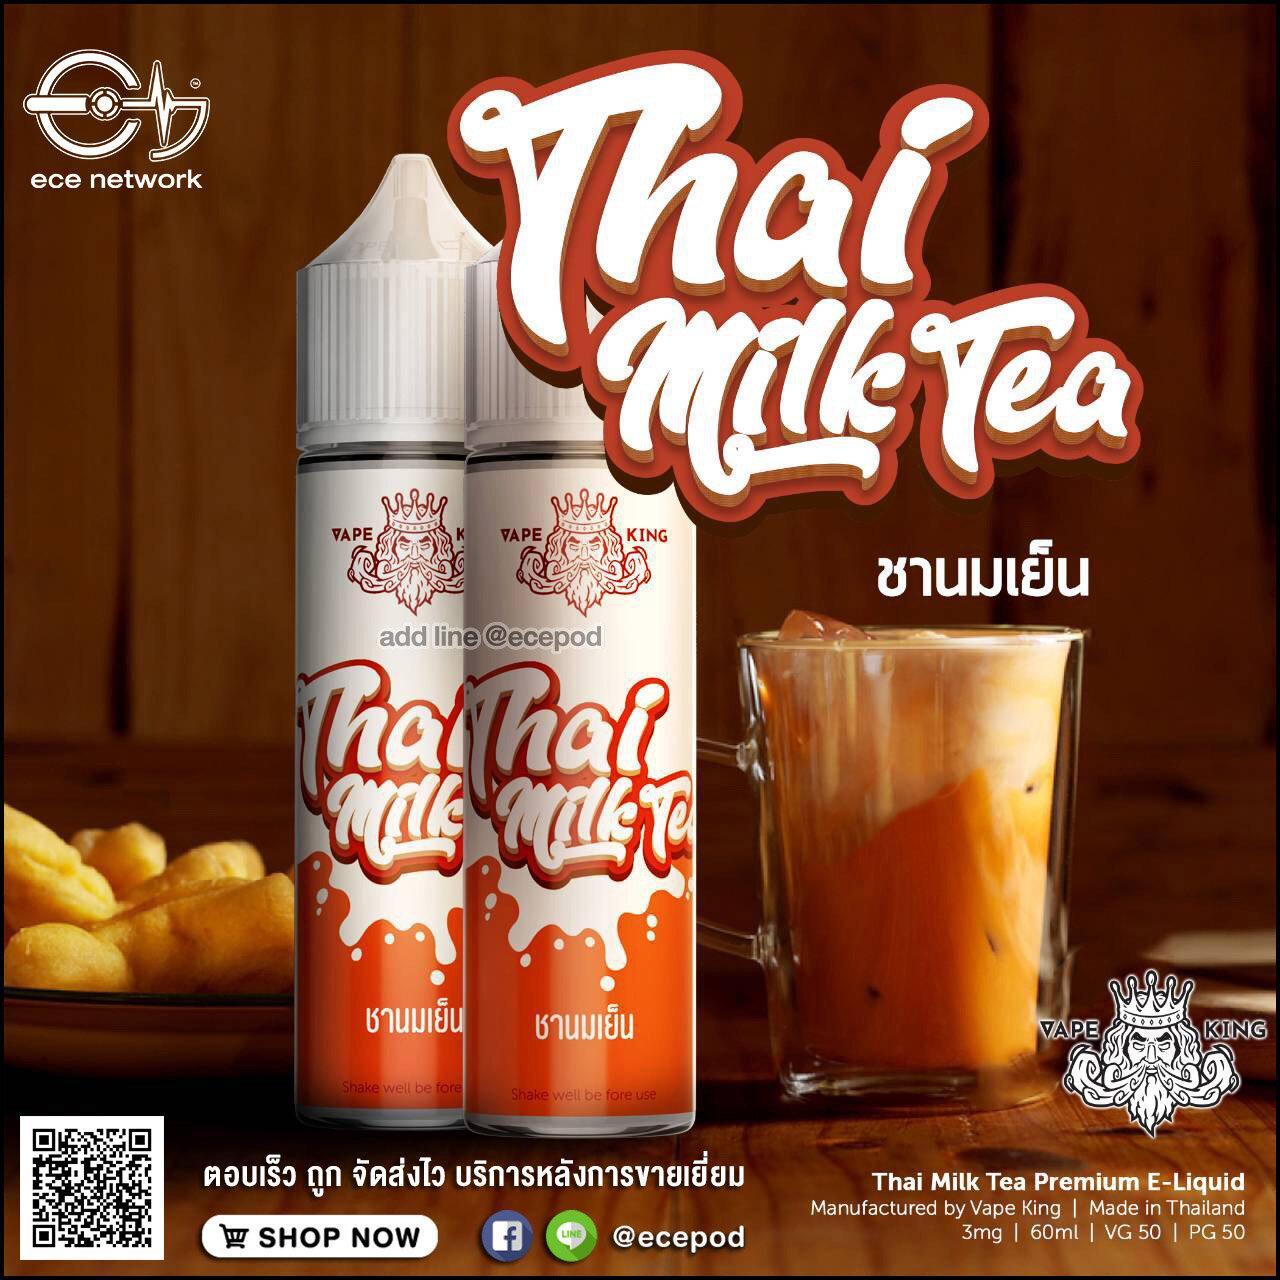 Vapeking Thai Milk Tea (ชานมเย็น) 60ml N3